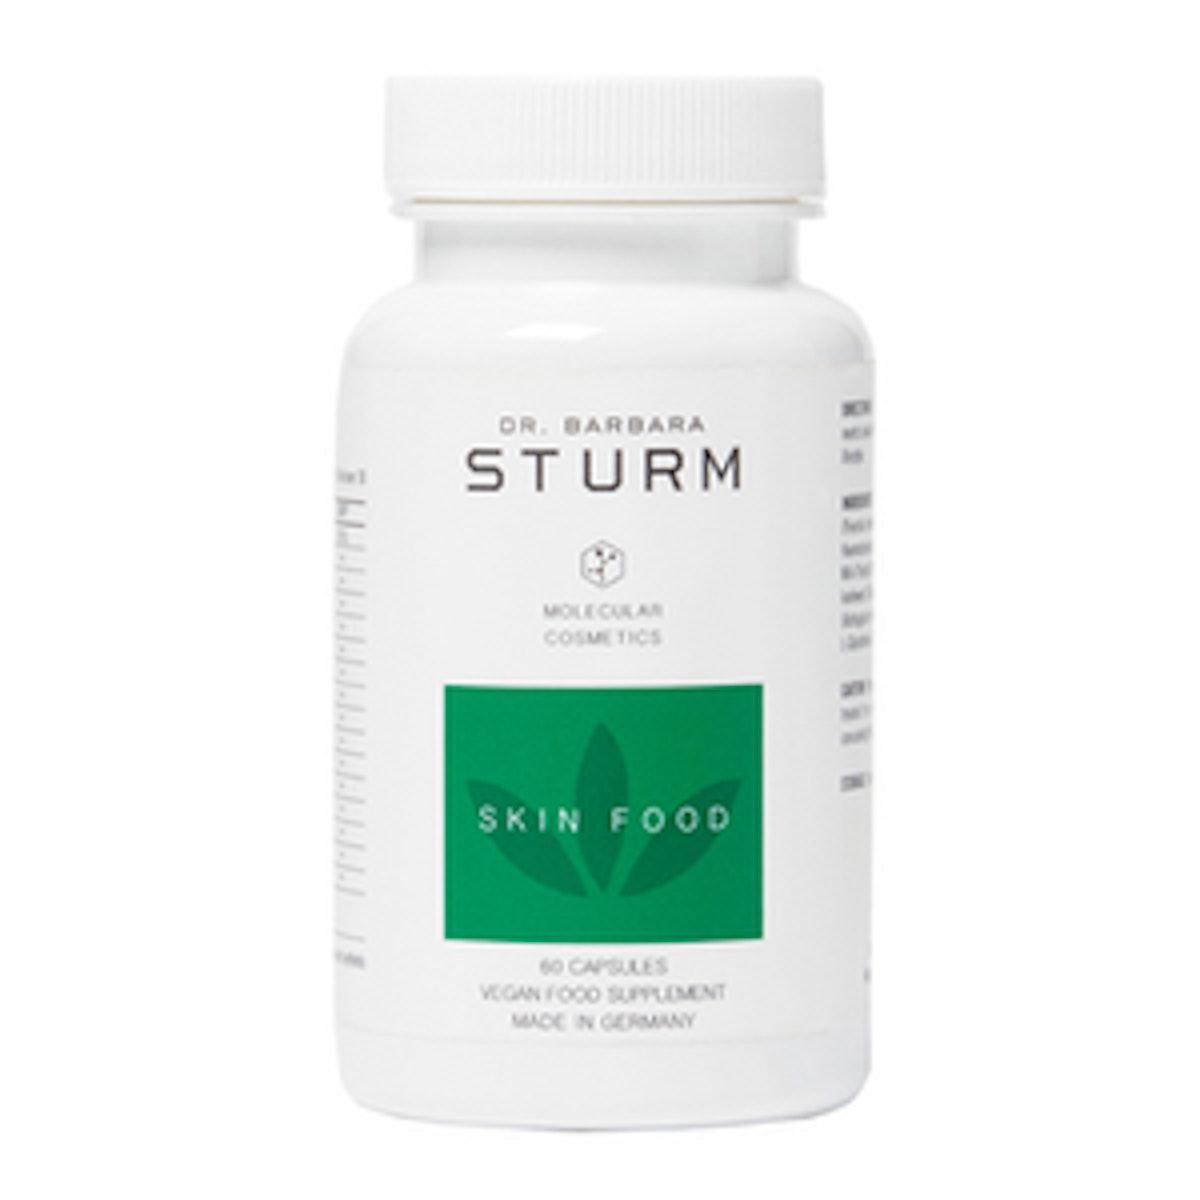 Dr. Barbara Sturm Skin Food Supplements